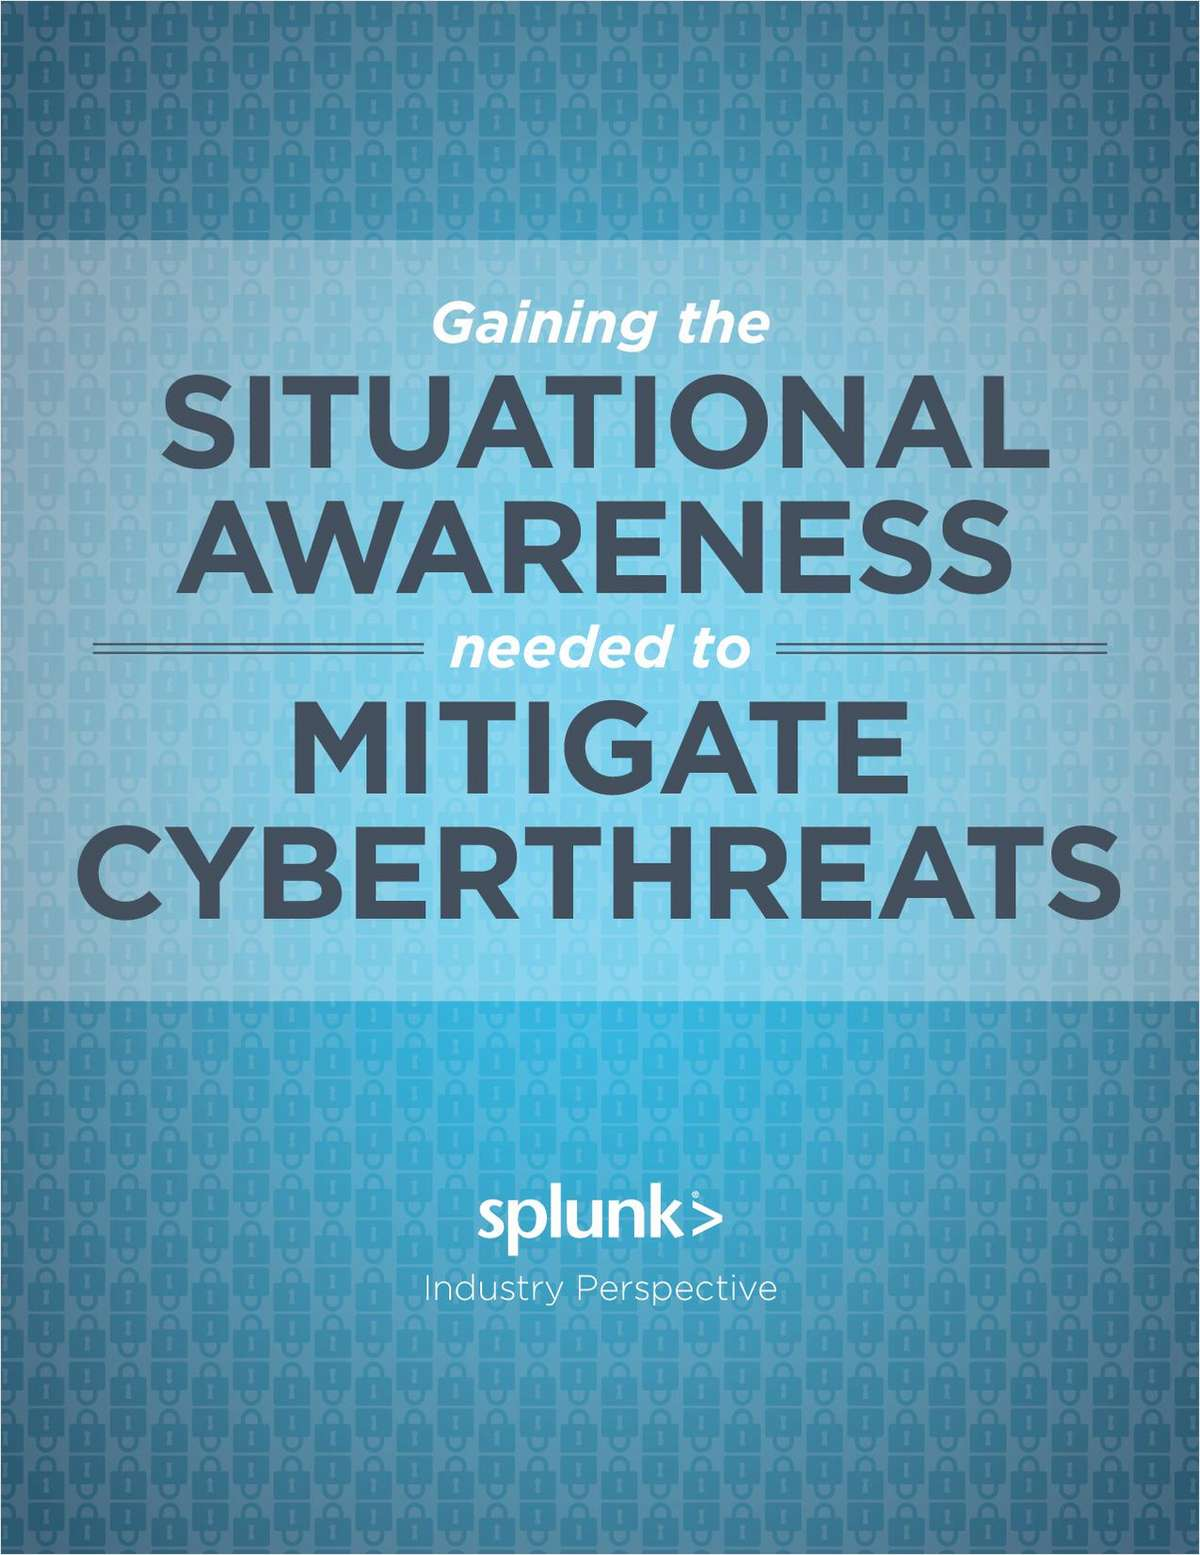 Gain Situational Awareness Needed To Mitigate Cyberthreats